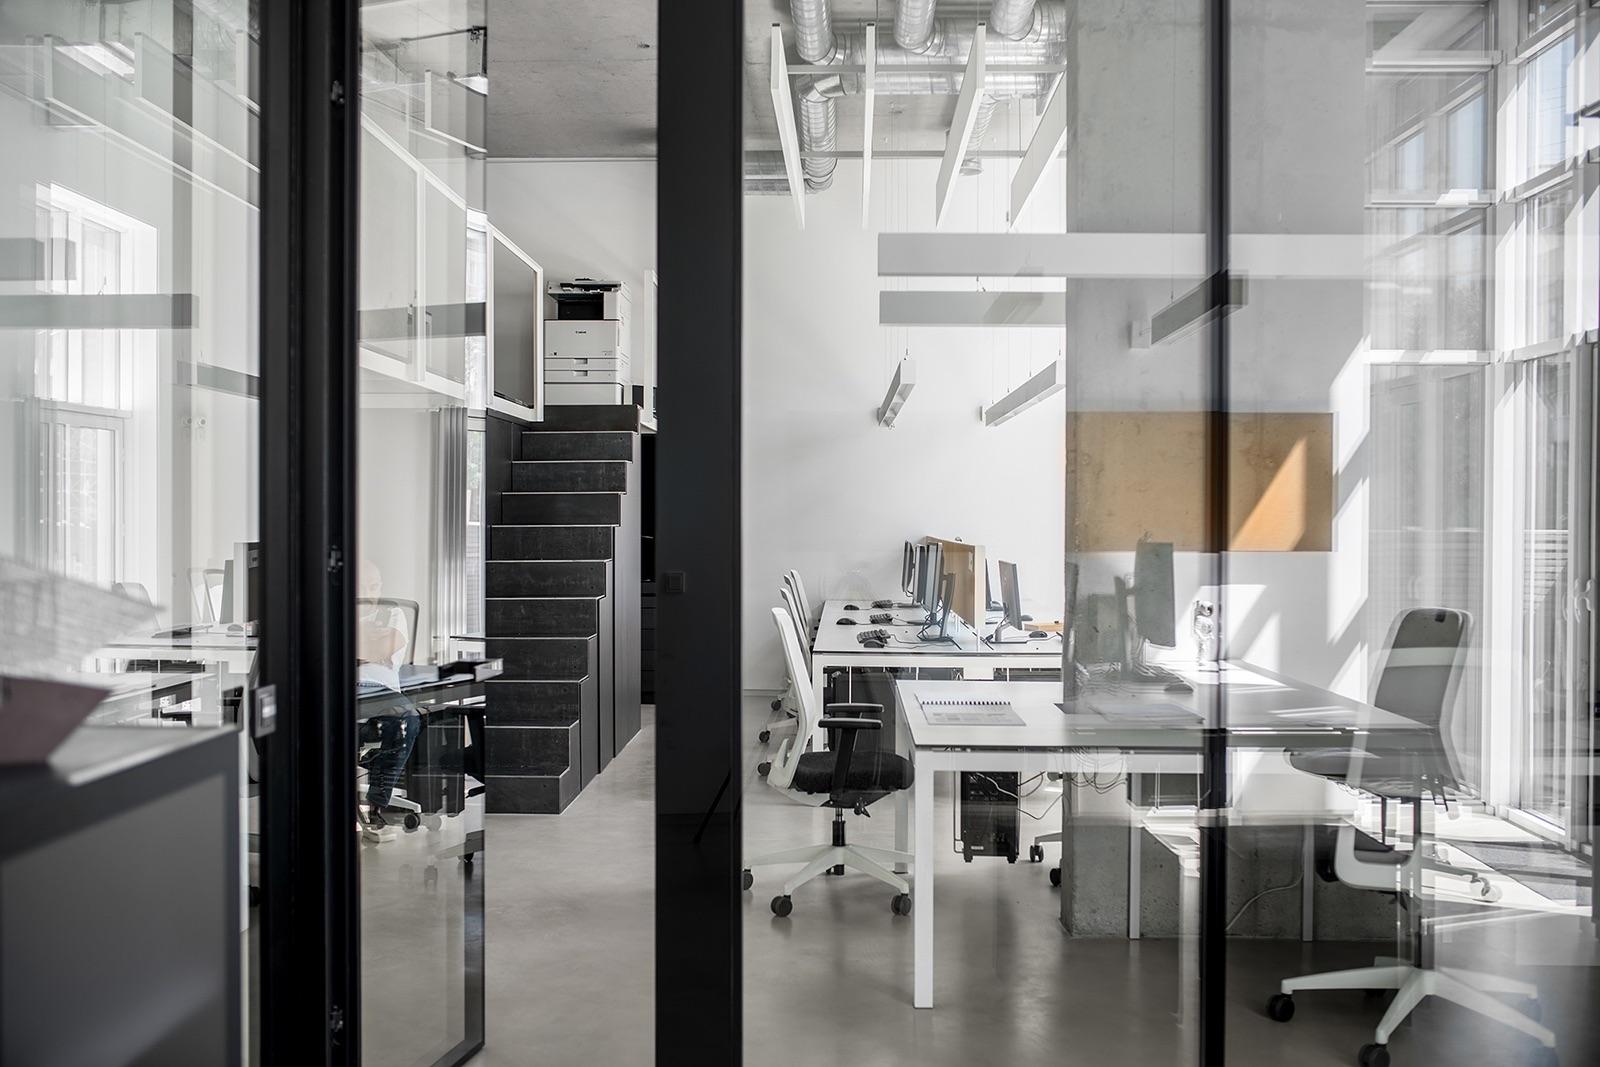 yod-design-lab-office-2